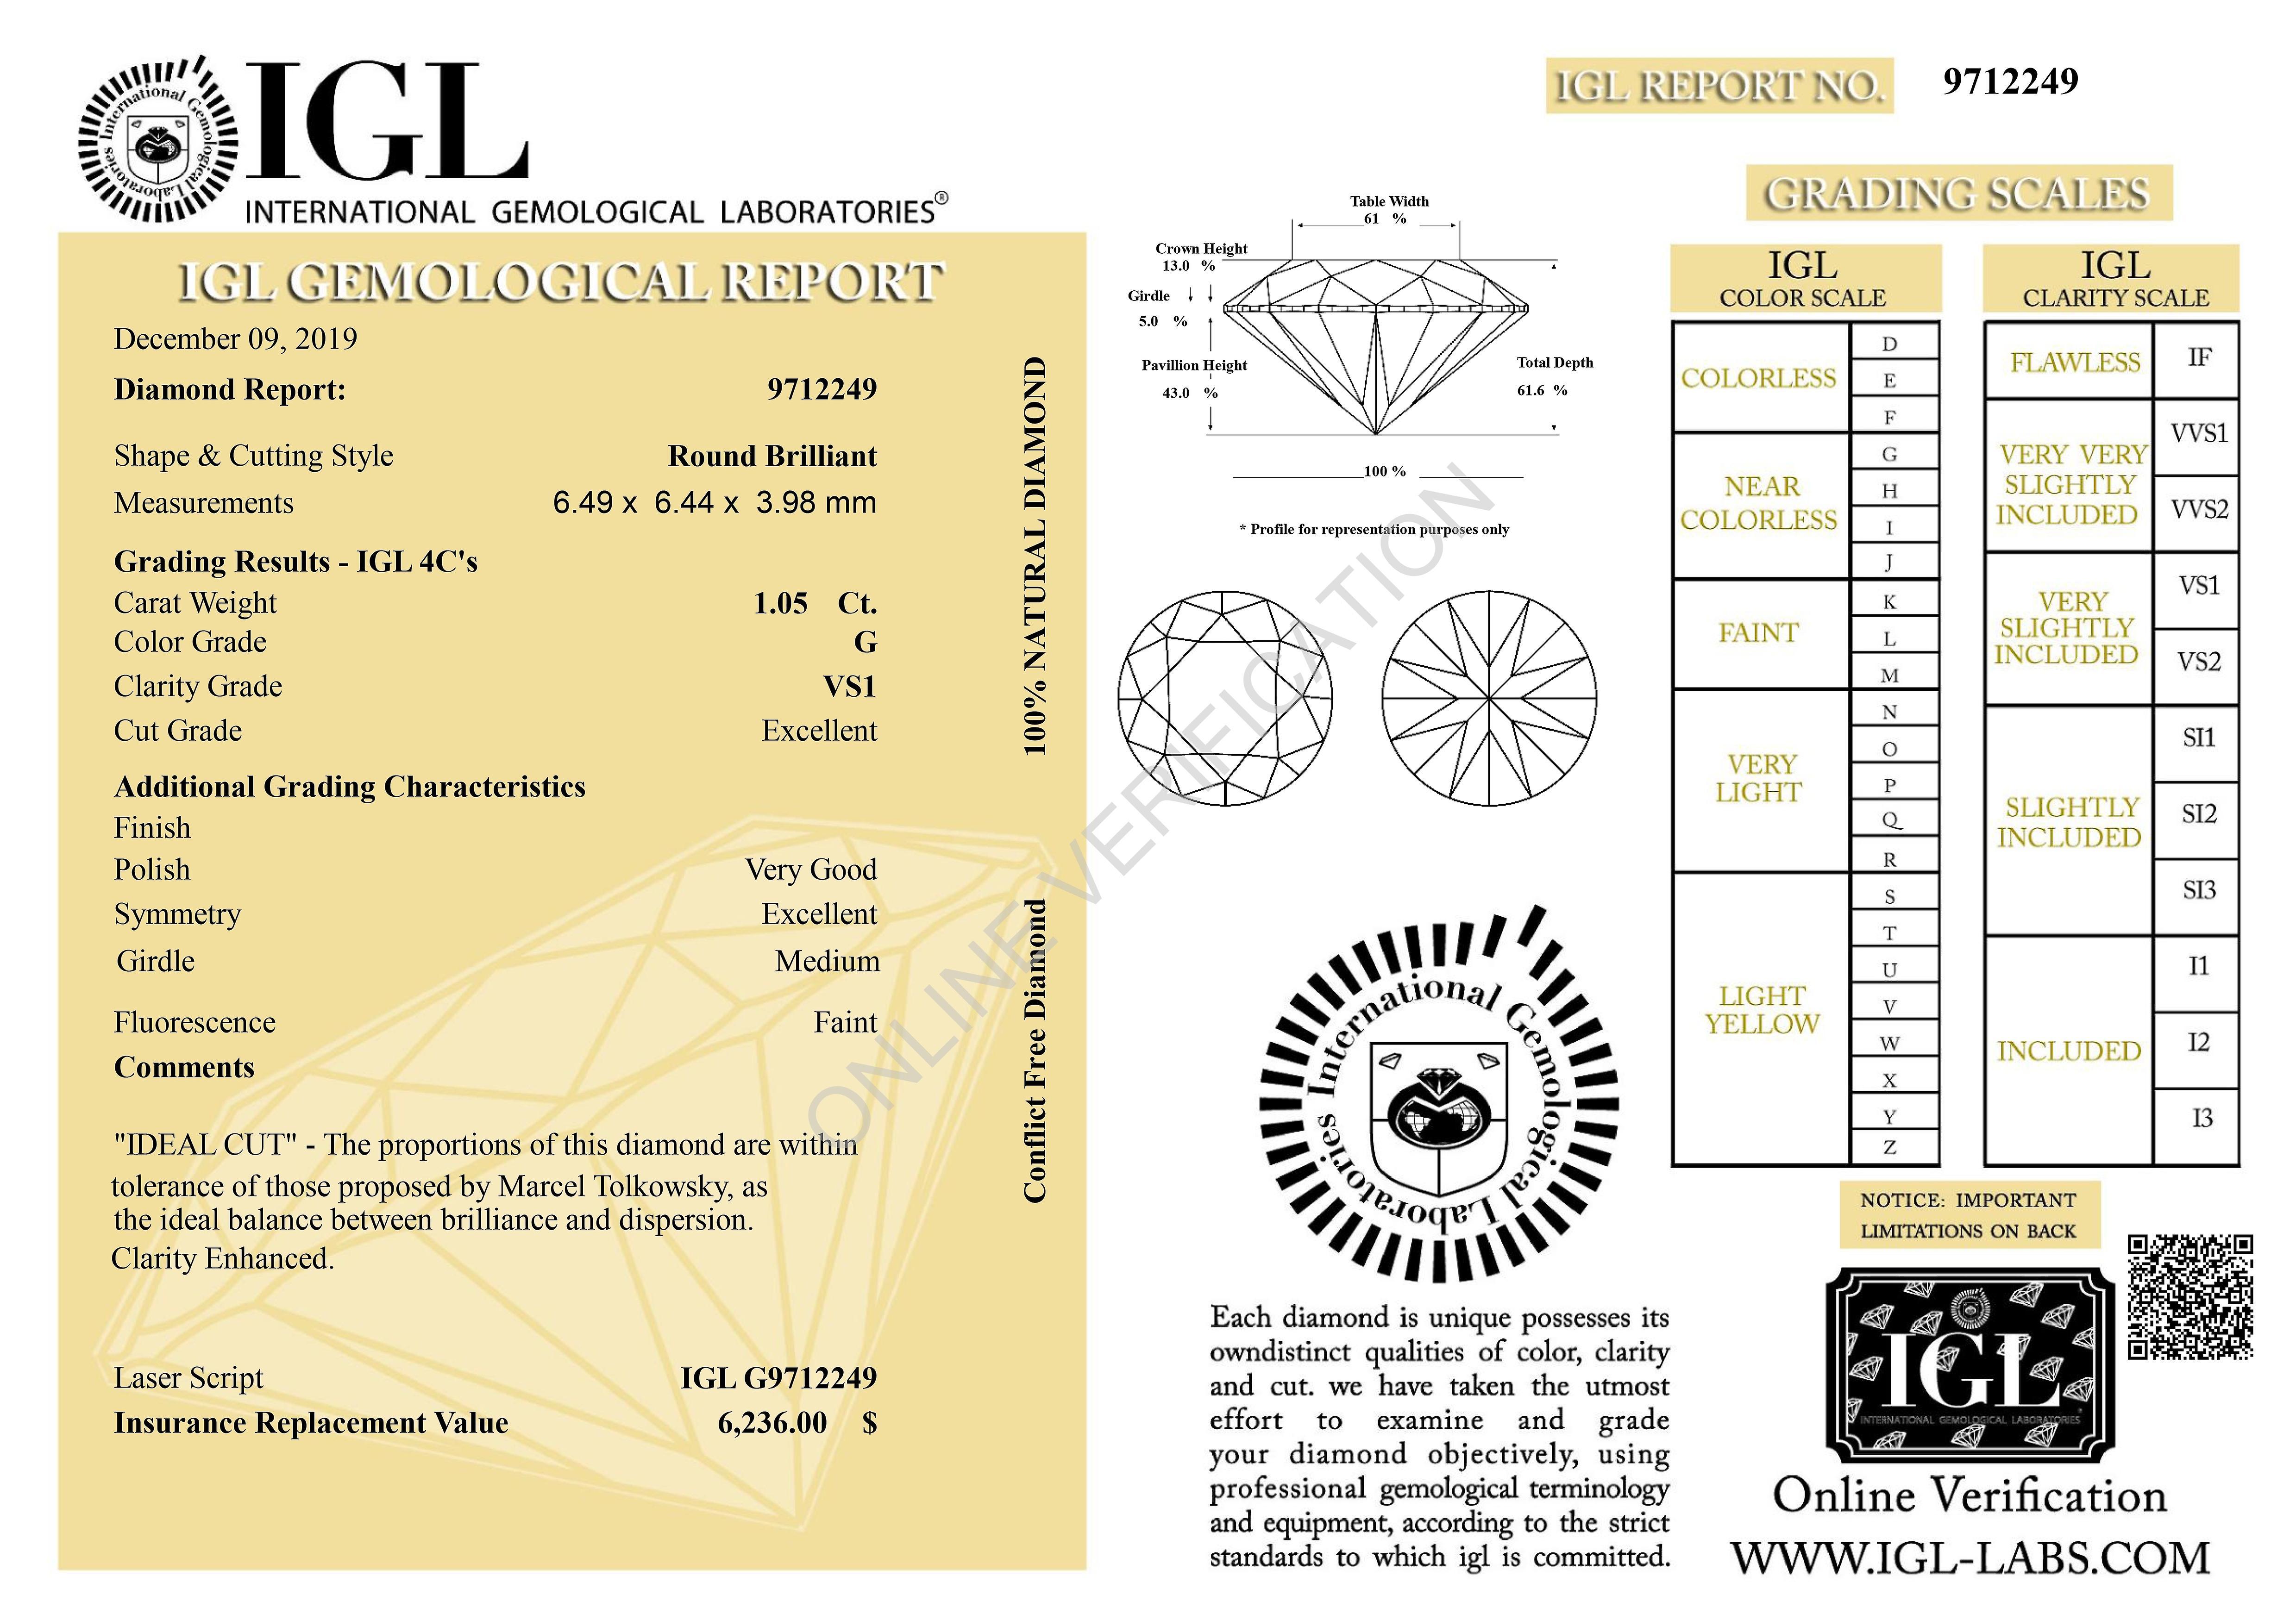 Certified 1.05 Carat G VS1 Round Brilliant Enhanced Natural Diamond 6.49m EX CUT